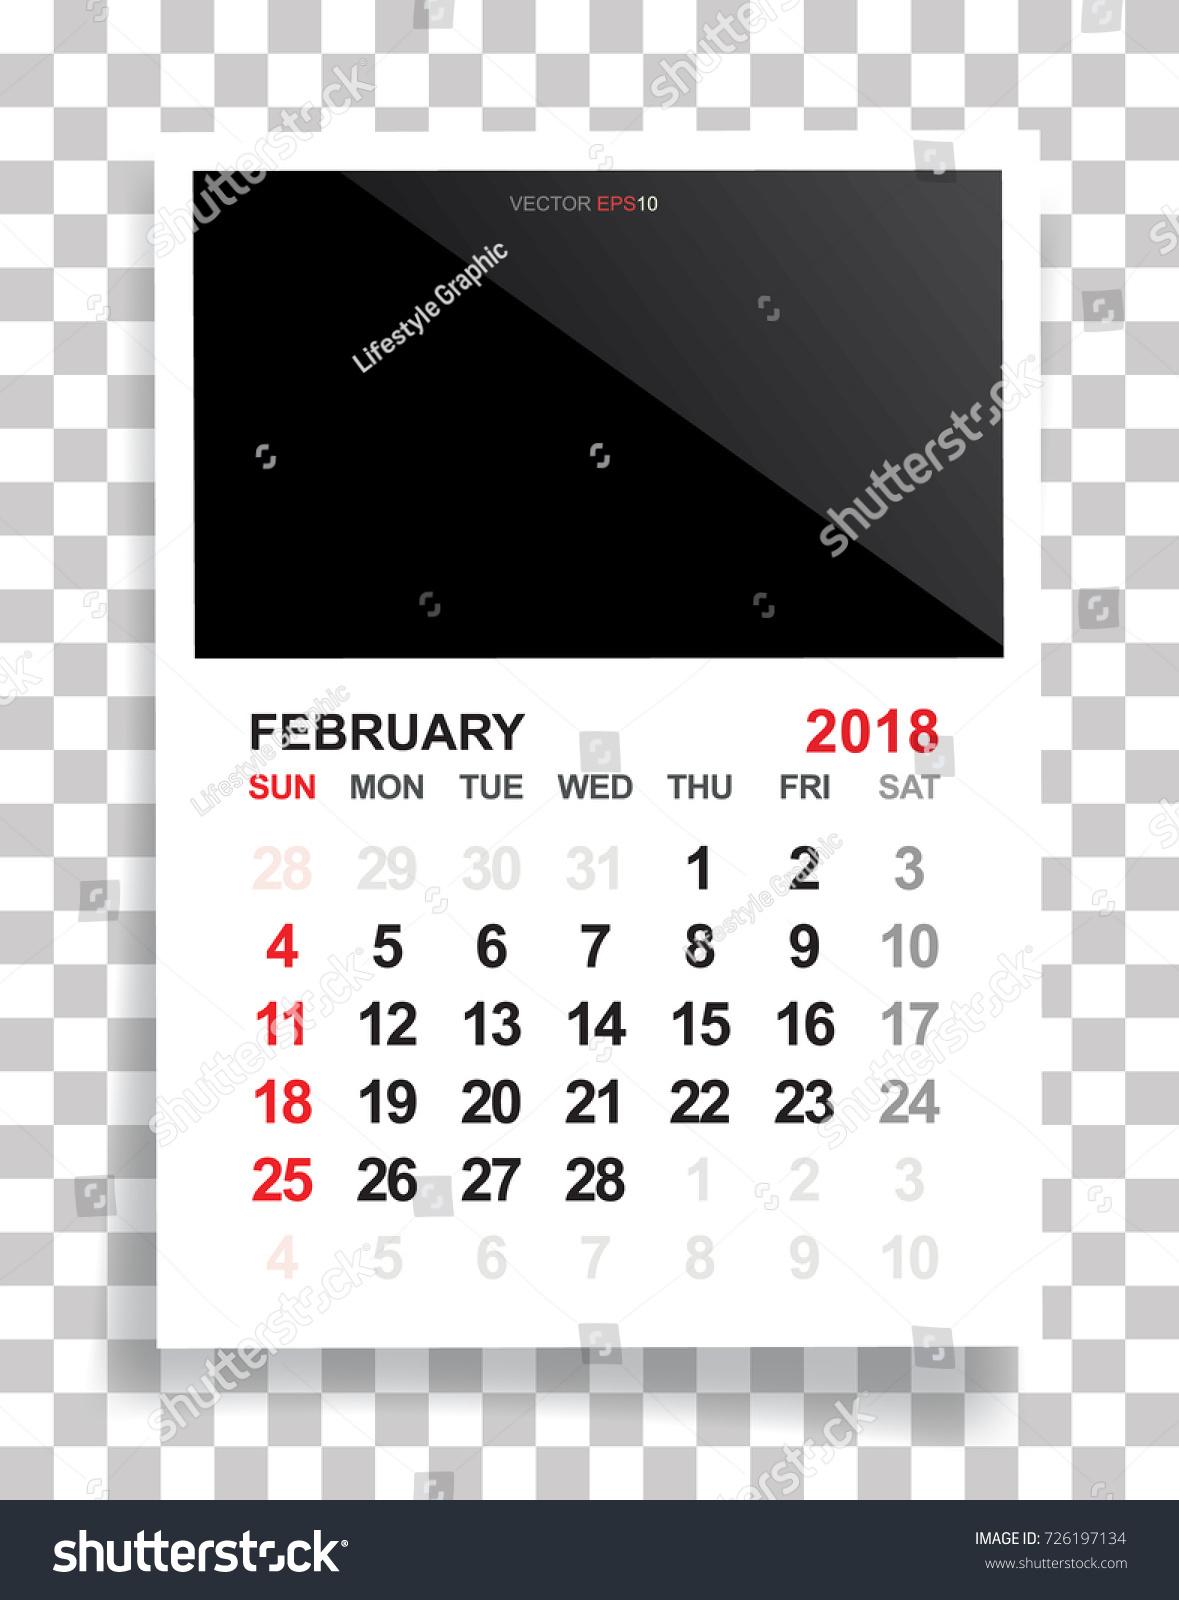 February 2018 Calendar Background Empty Photo Stock Vector ...